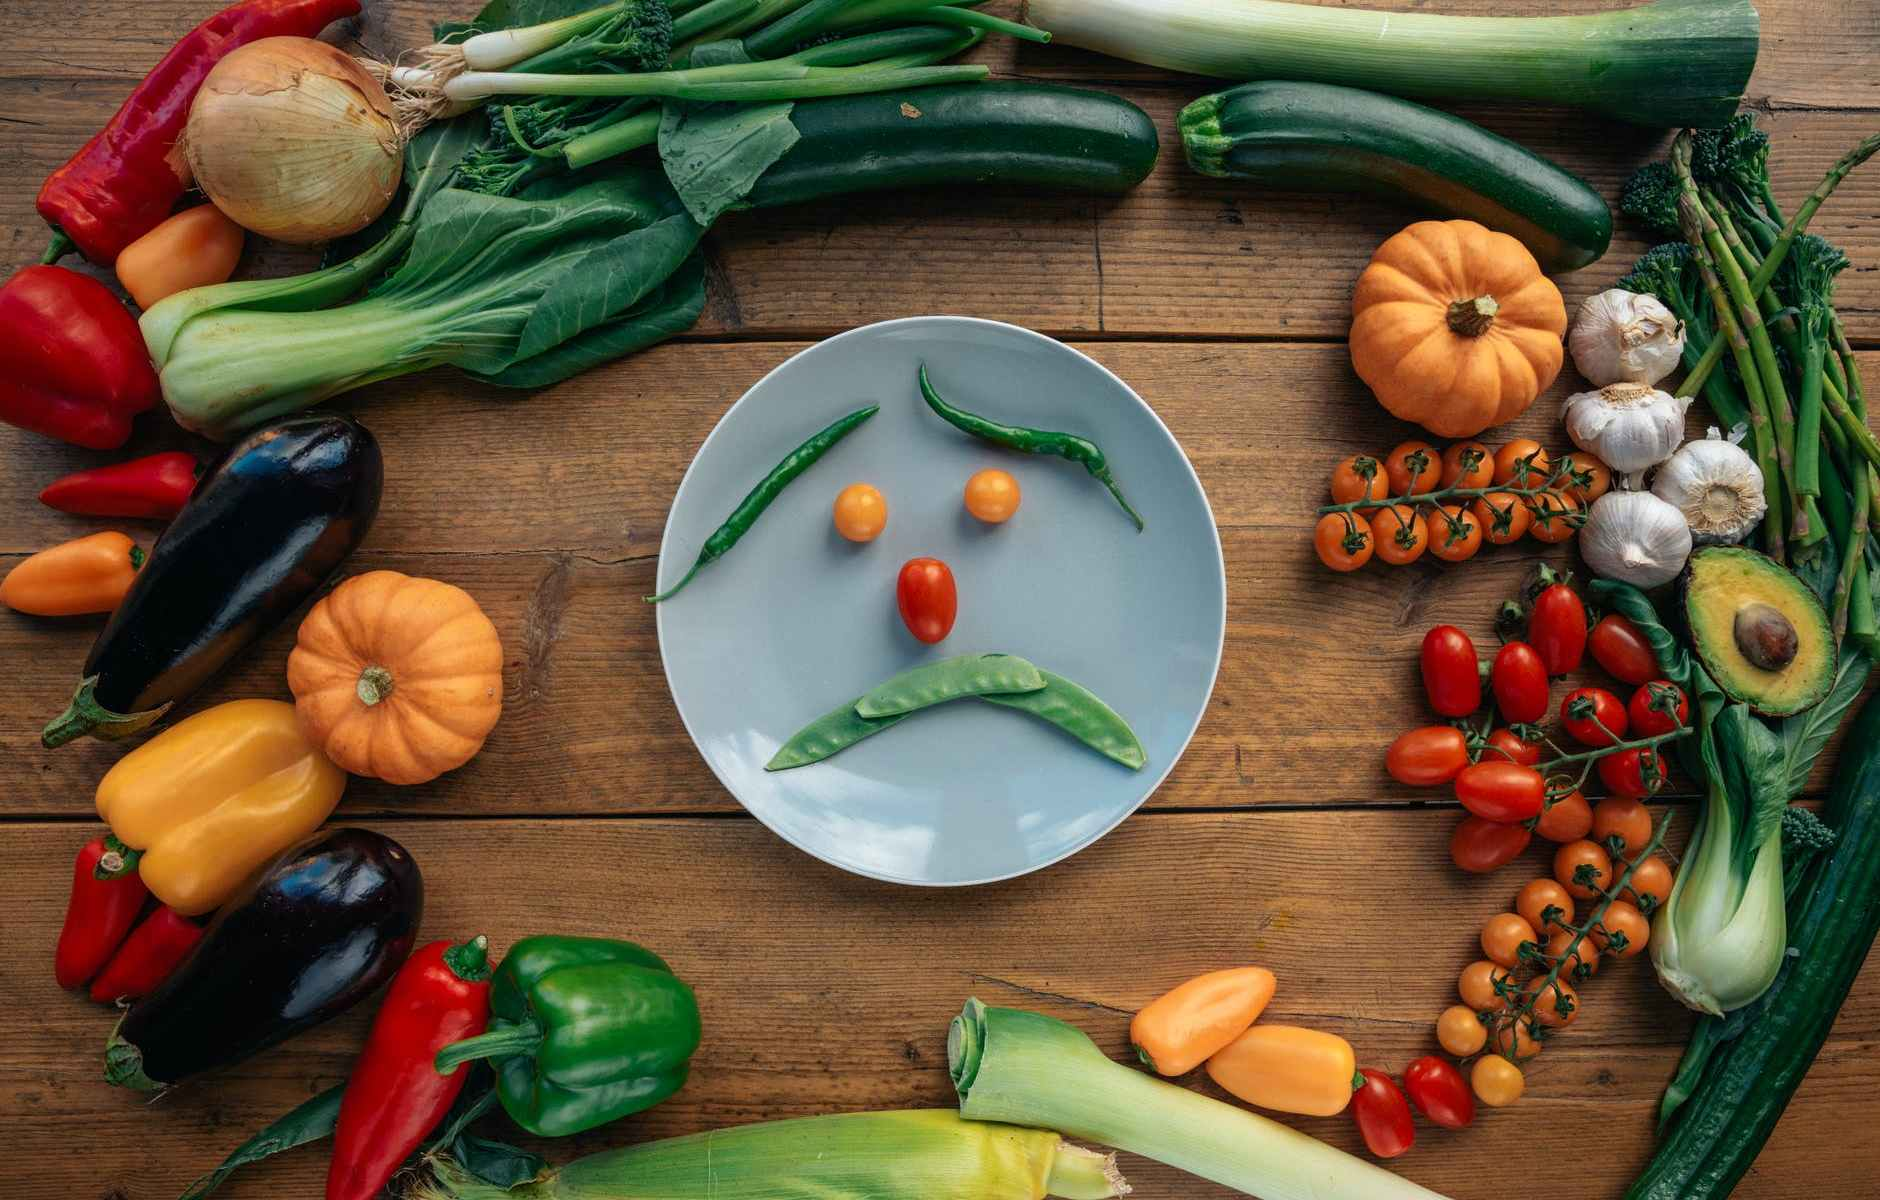 green chili pepper and orange tomatoes on white ceramic plate